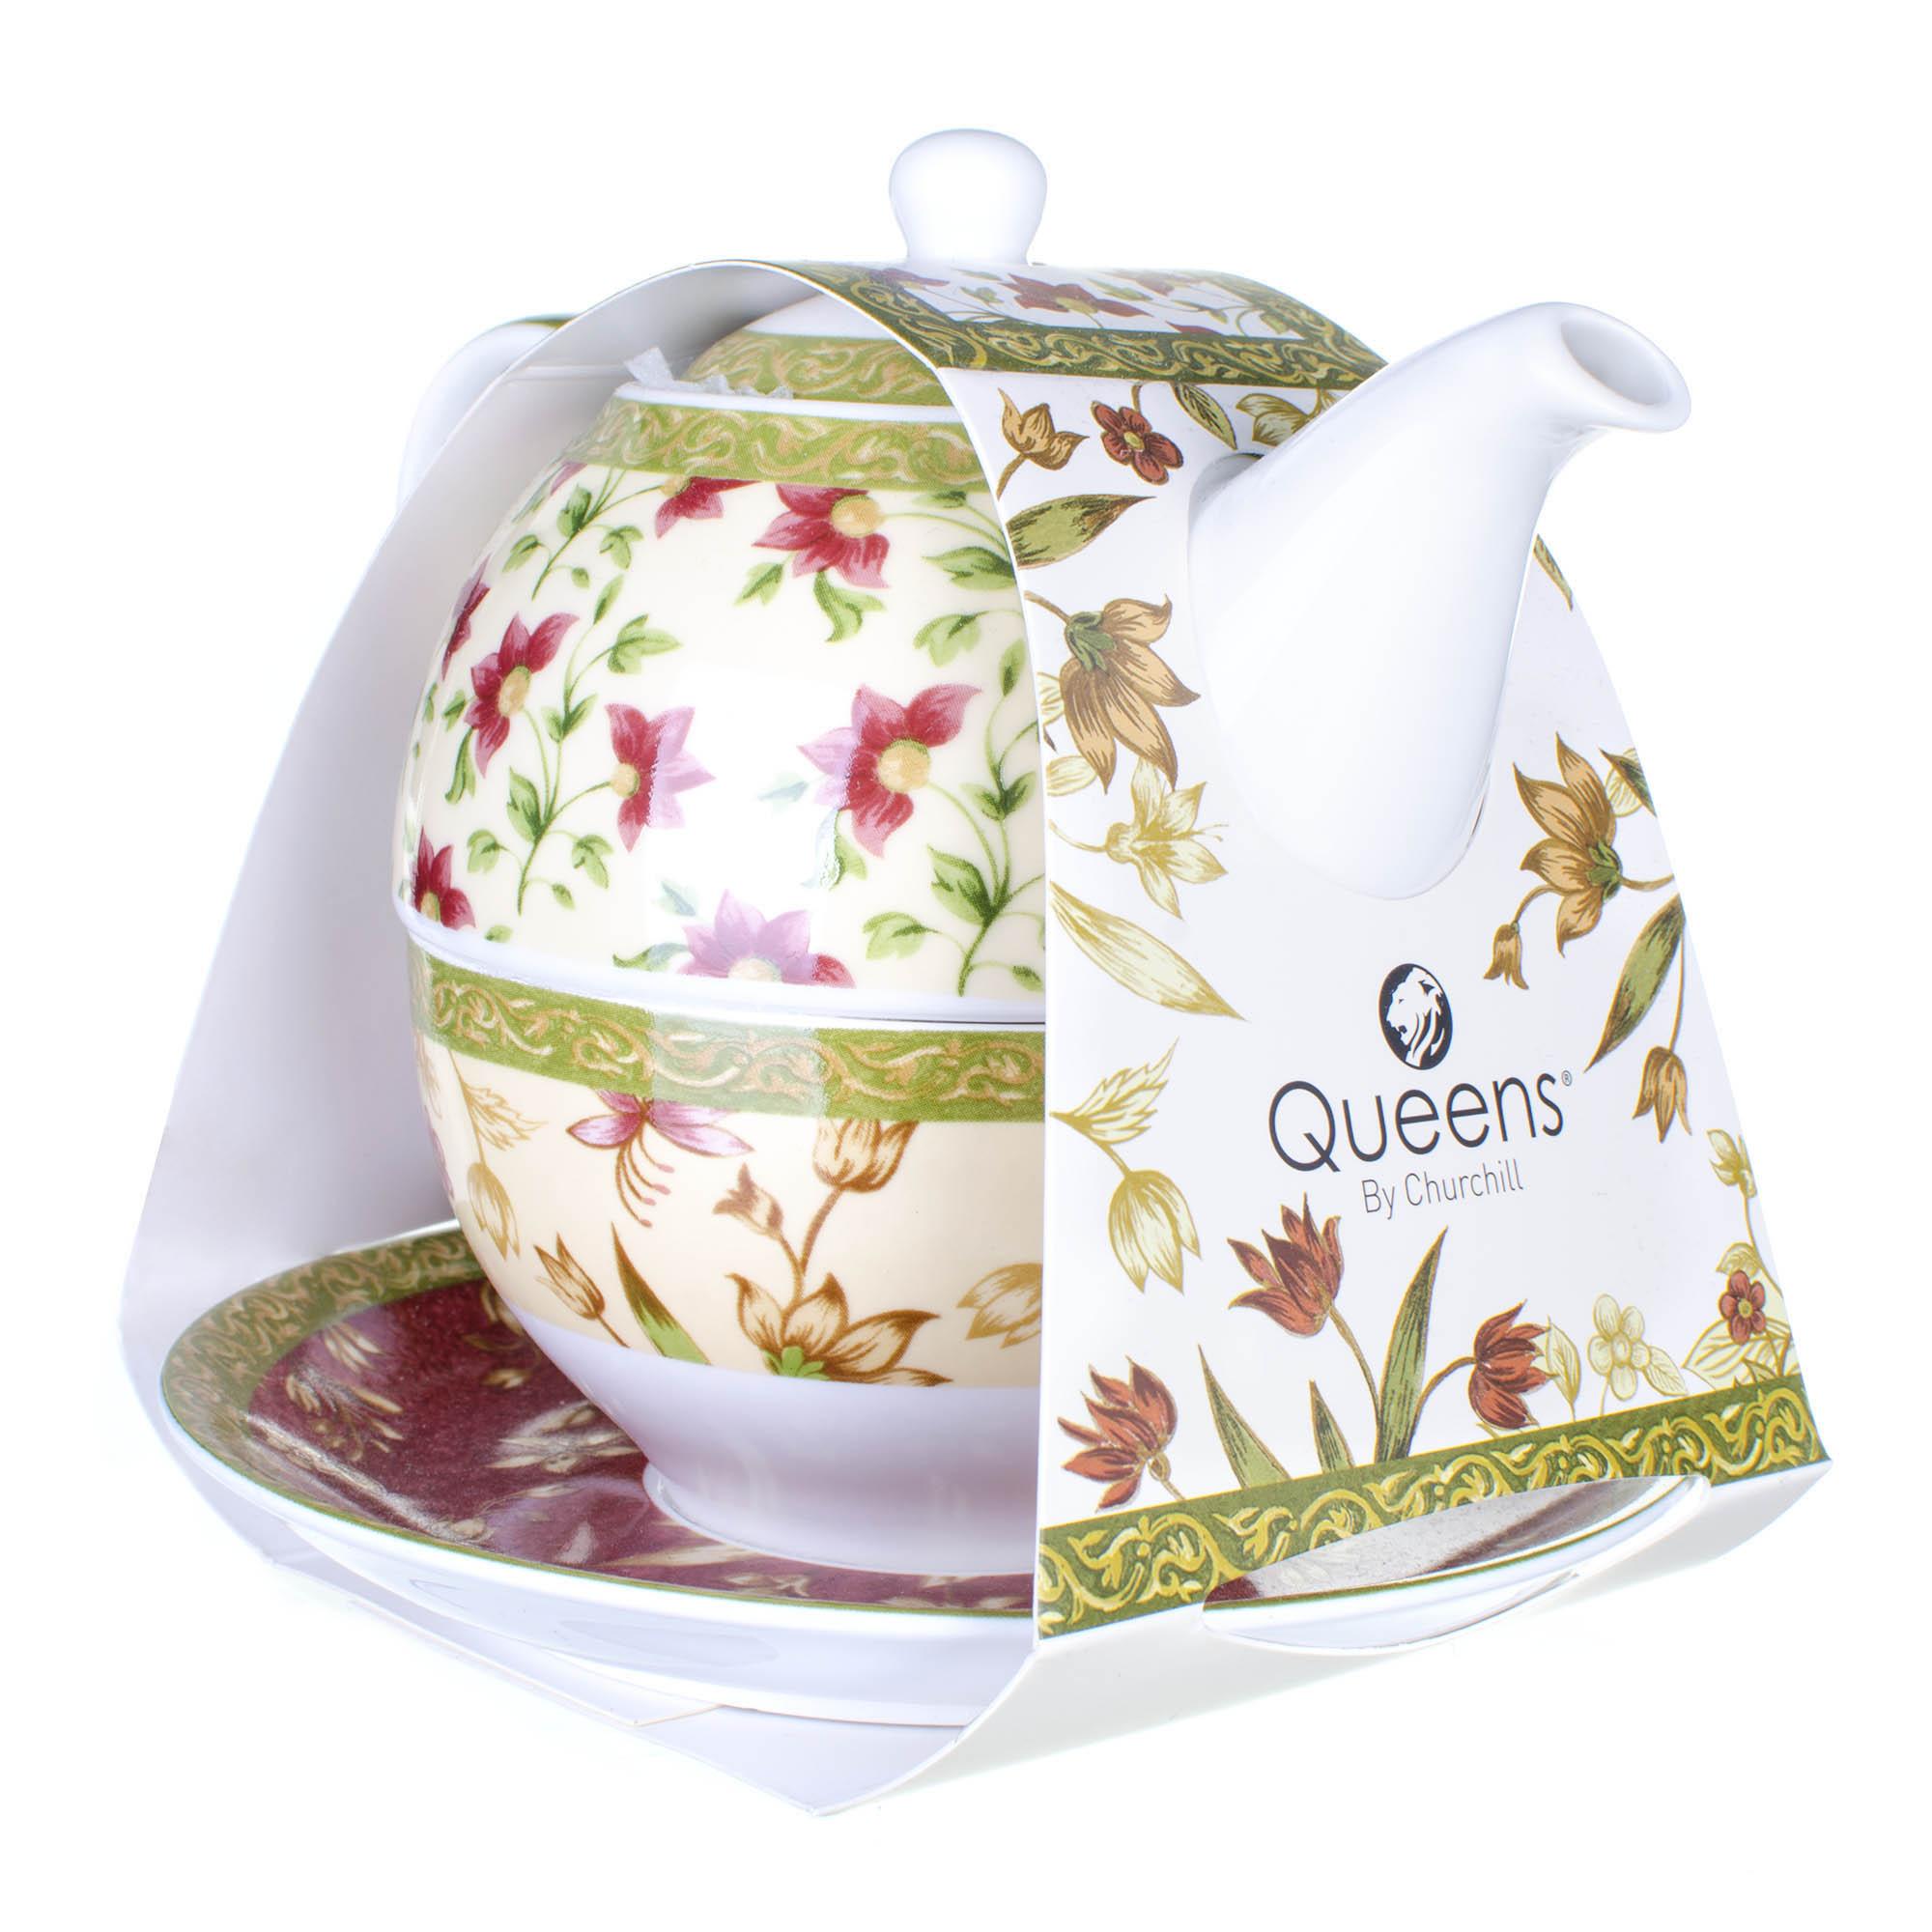 Фото - Набор цейлон 3 предмета Churchill CEYL00061 набор чайный гималайские цветы 3 предмета churchill himf00081